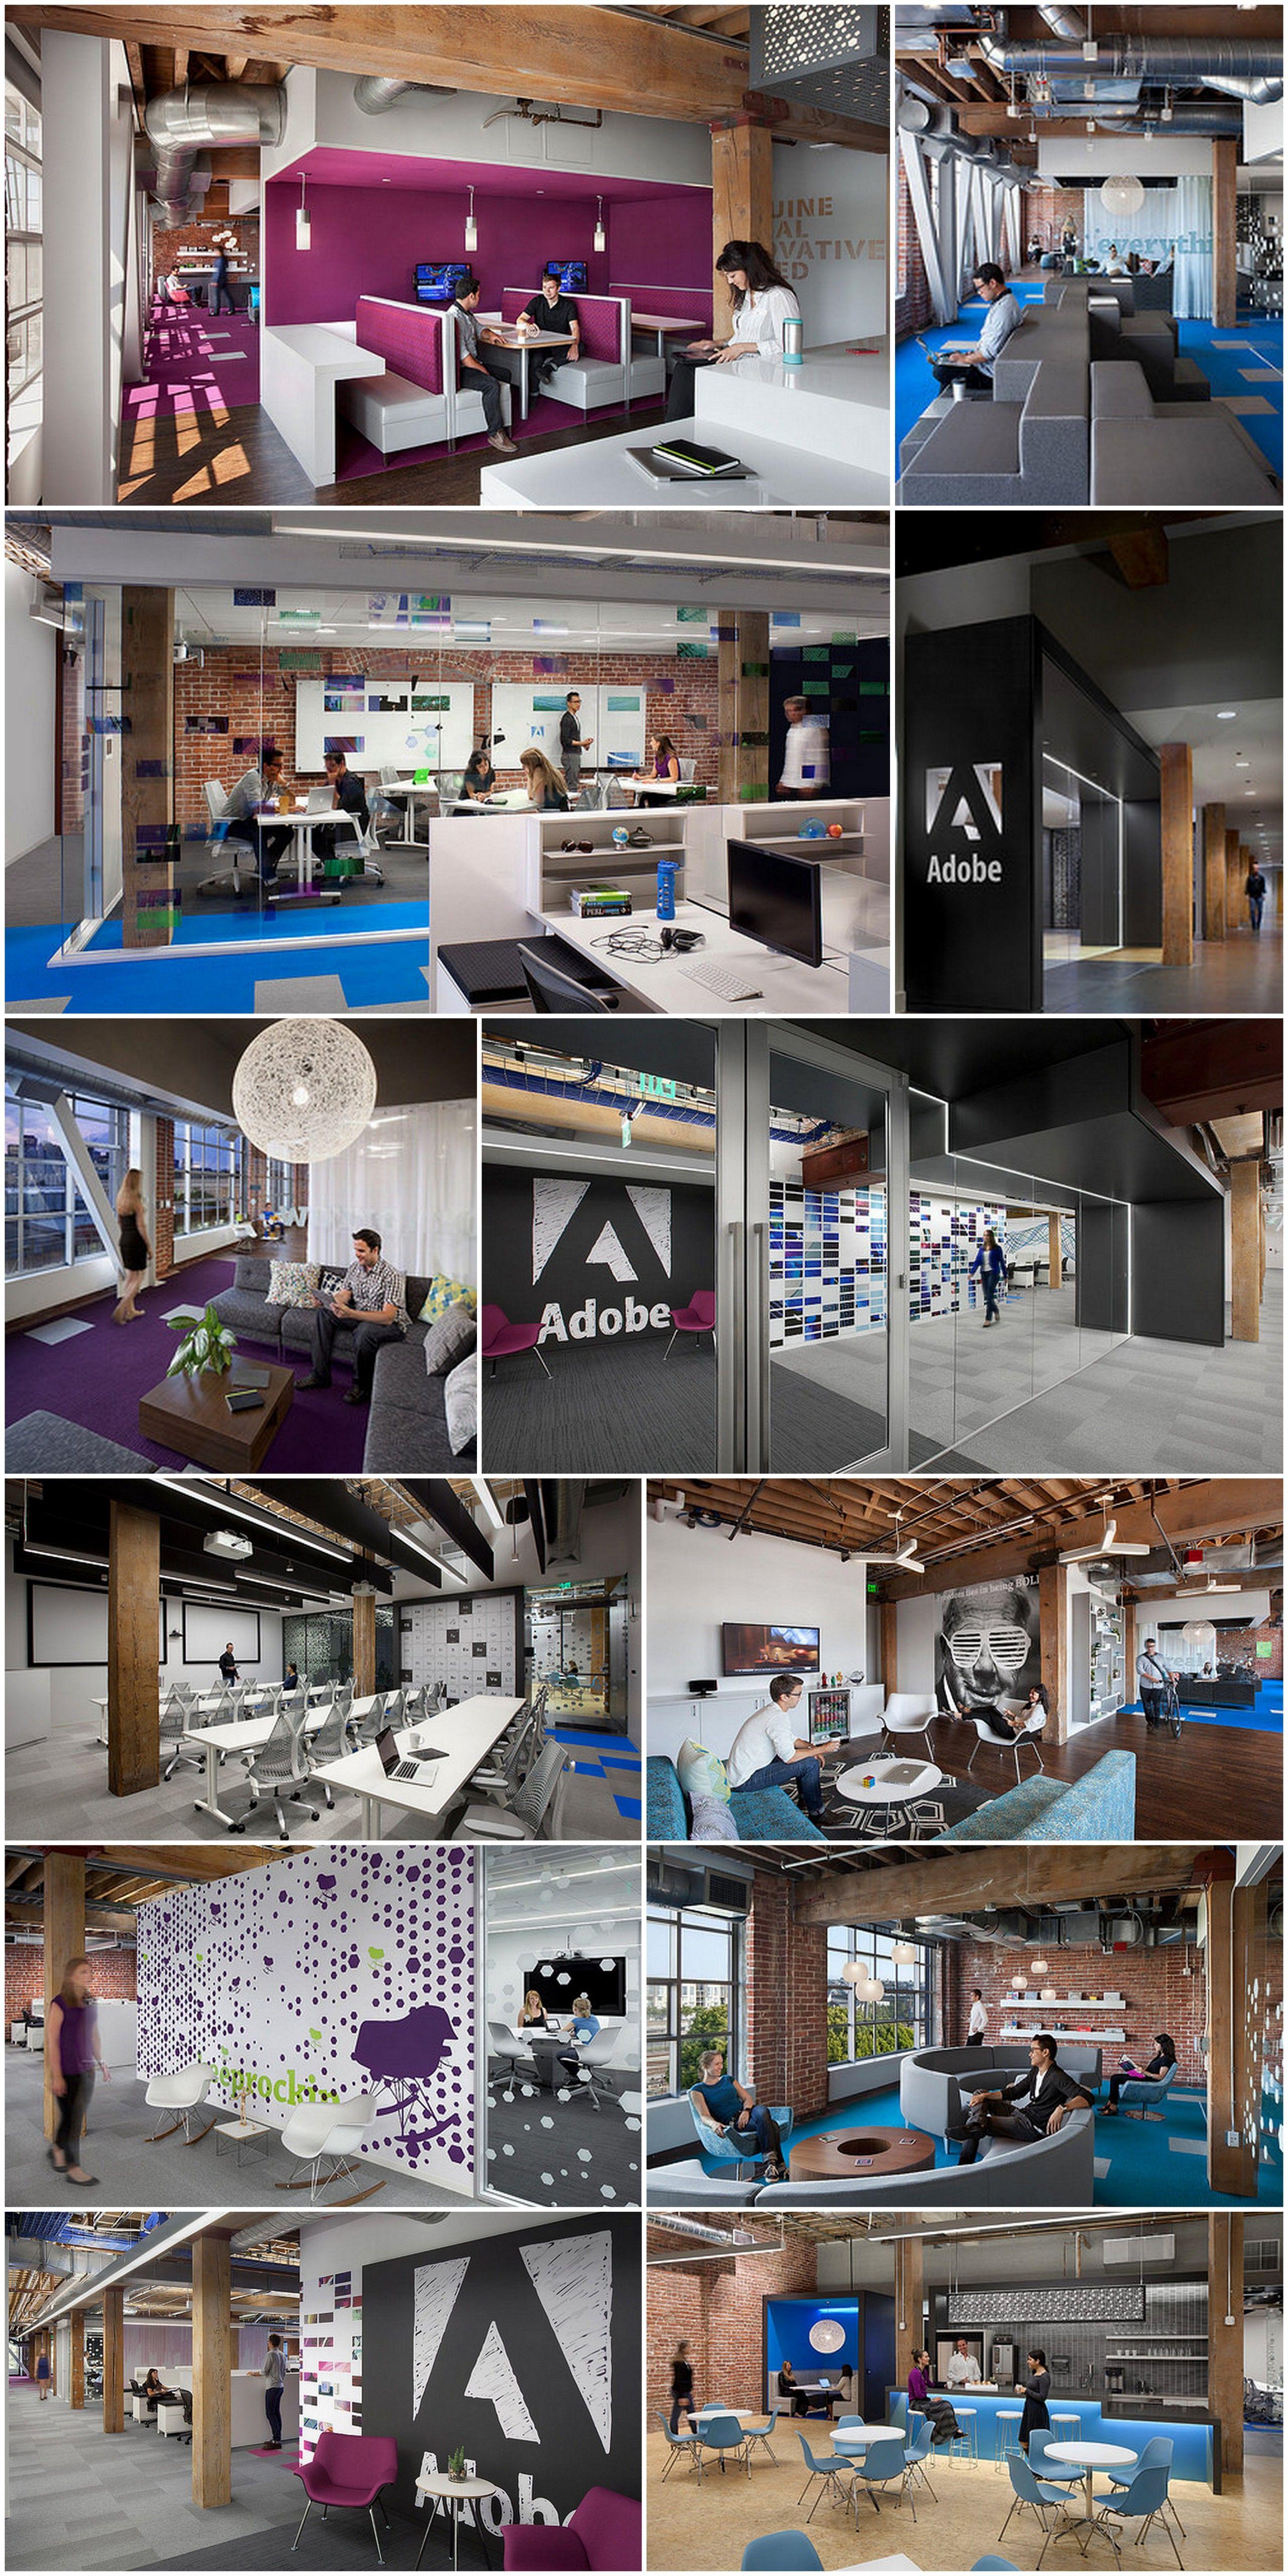 Adobe new office at San Francisco | #creative #office #design ...